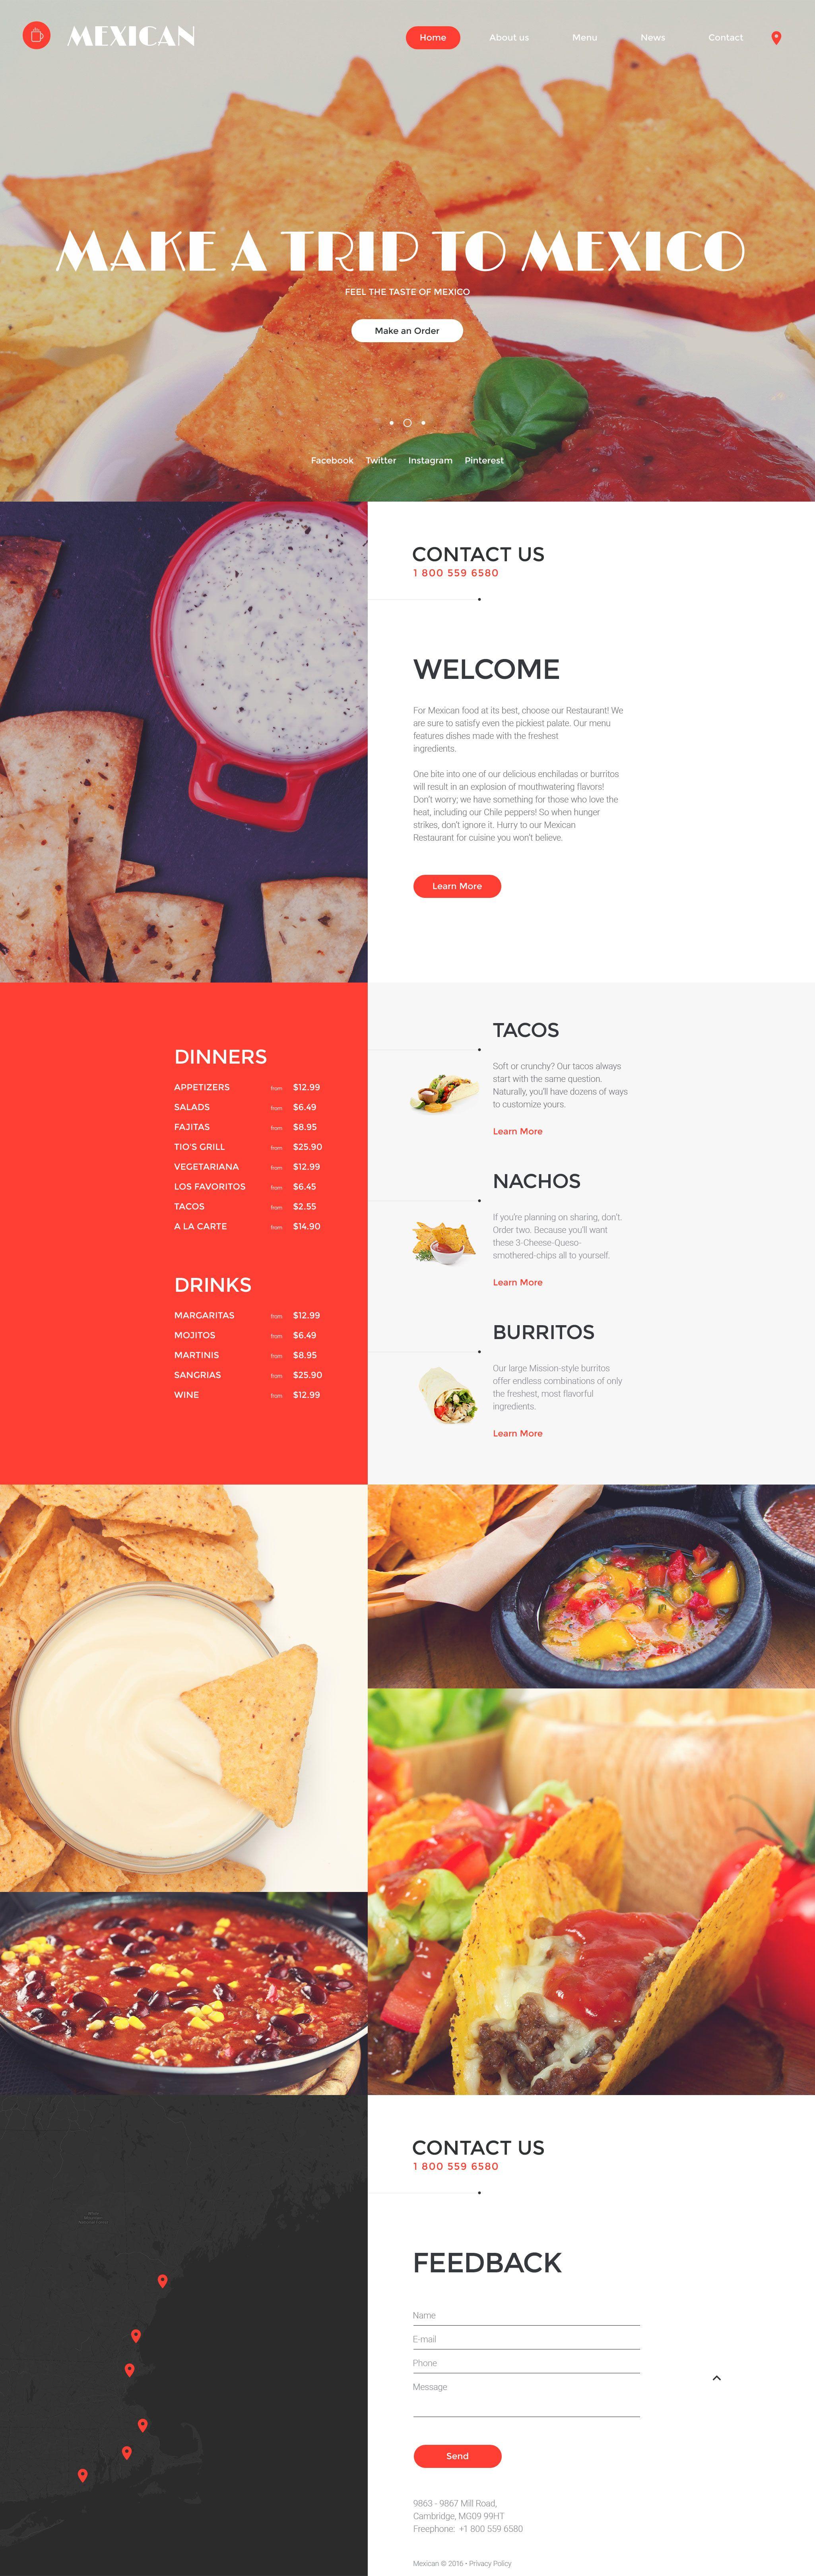 Mexican website template new website templates pinterest restaurant management company site template httptemplatemonster website templatesmexican website template 58197ml maxwellsz